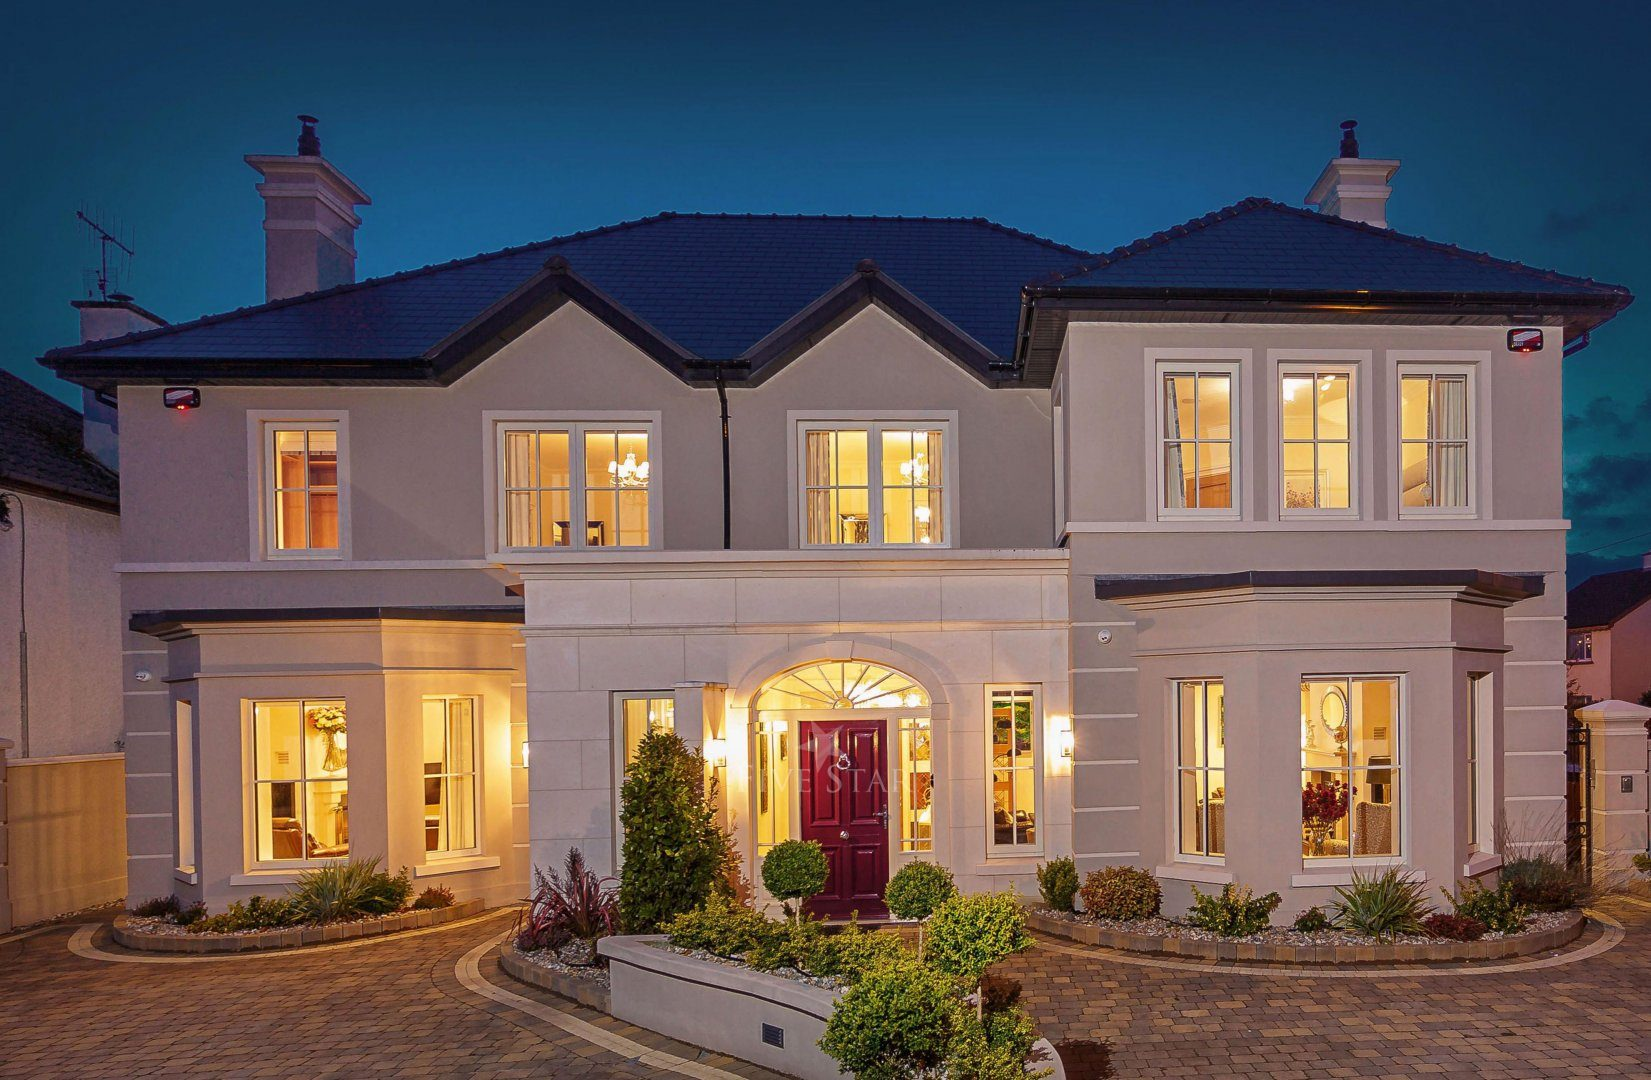 5-Star Killarney Residence photo 1